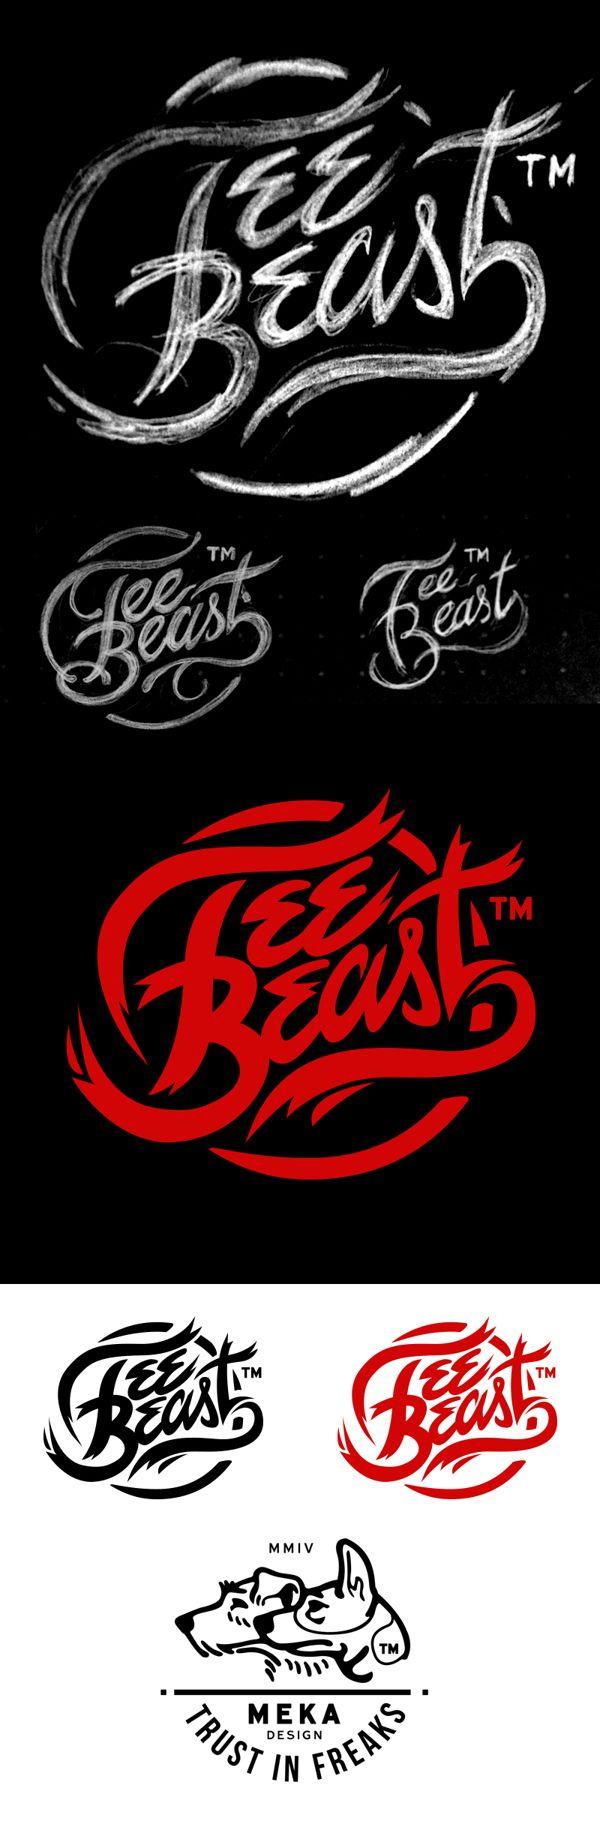 typhography | tee beast logo design | by meka